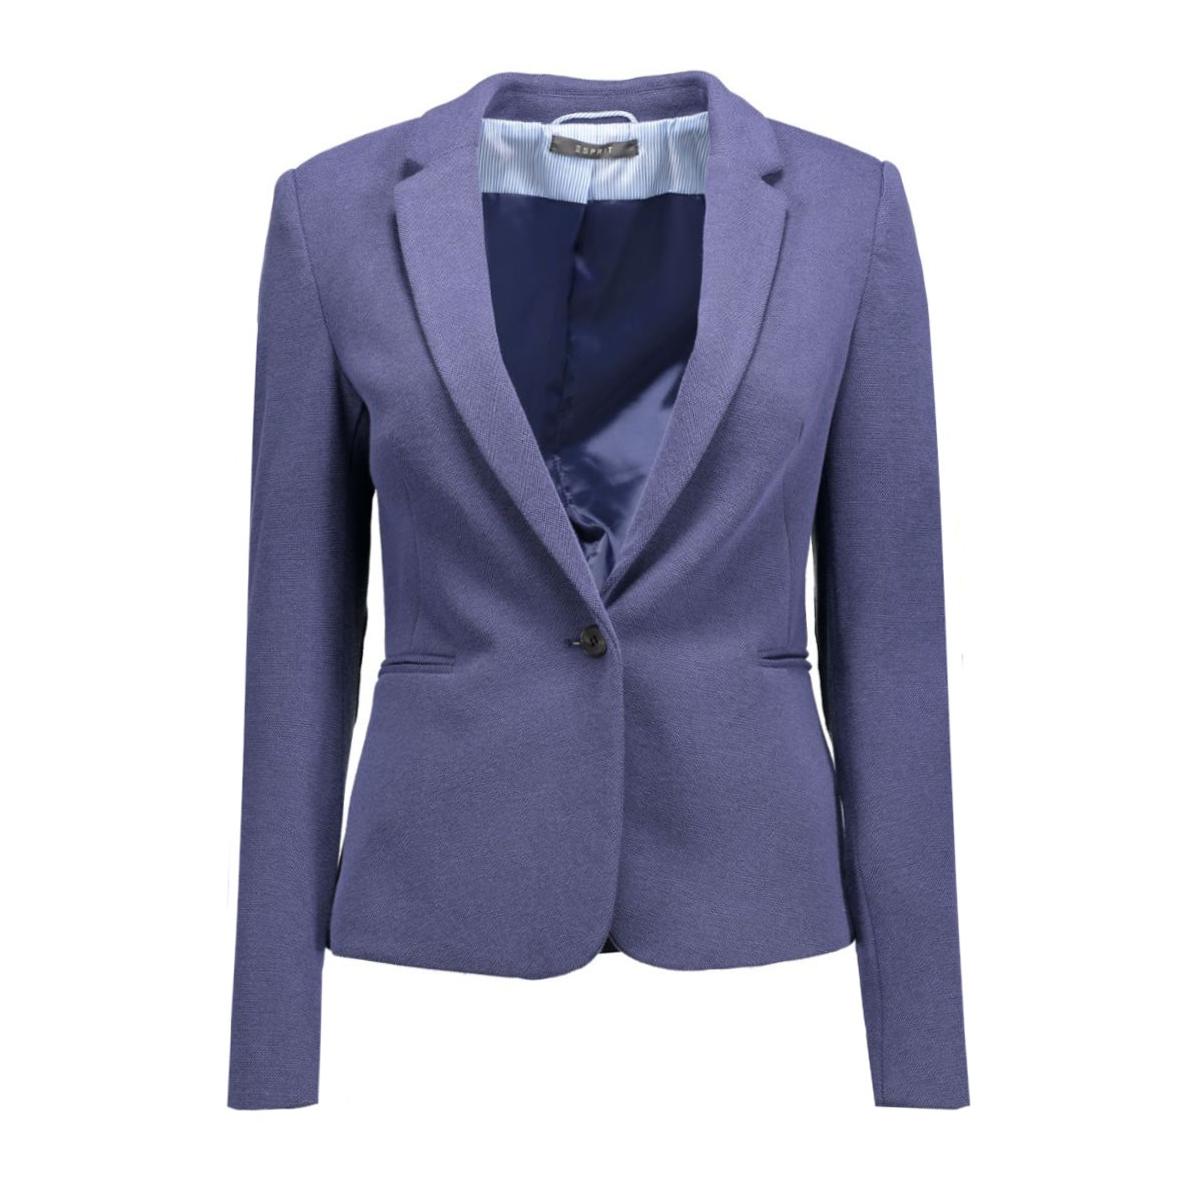 995eo1g905 esprit collection blazer e400